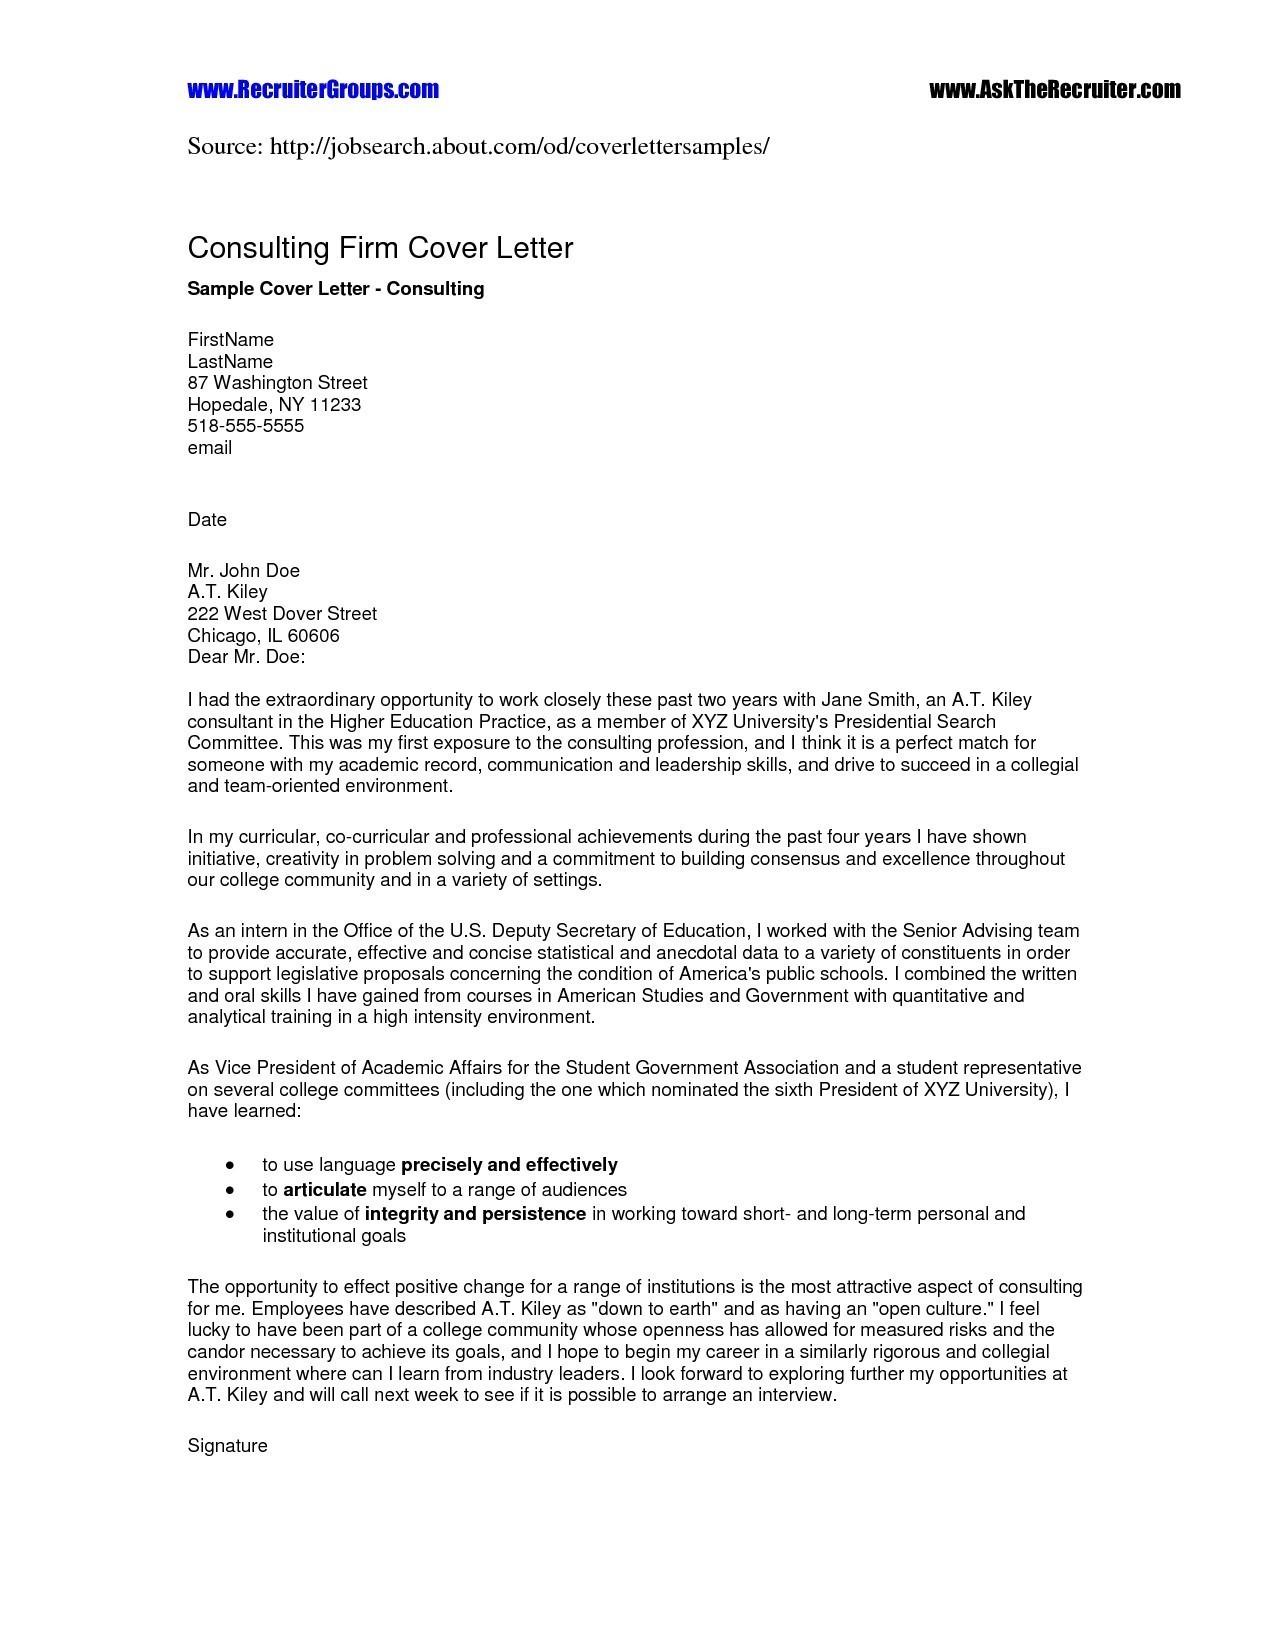 Dear Seller Letter Template - Job Application Letter format Template Copy Cover Letter Template Hr